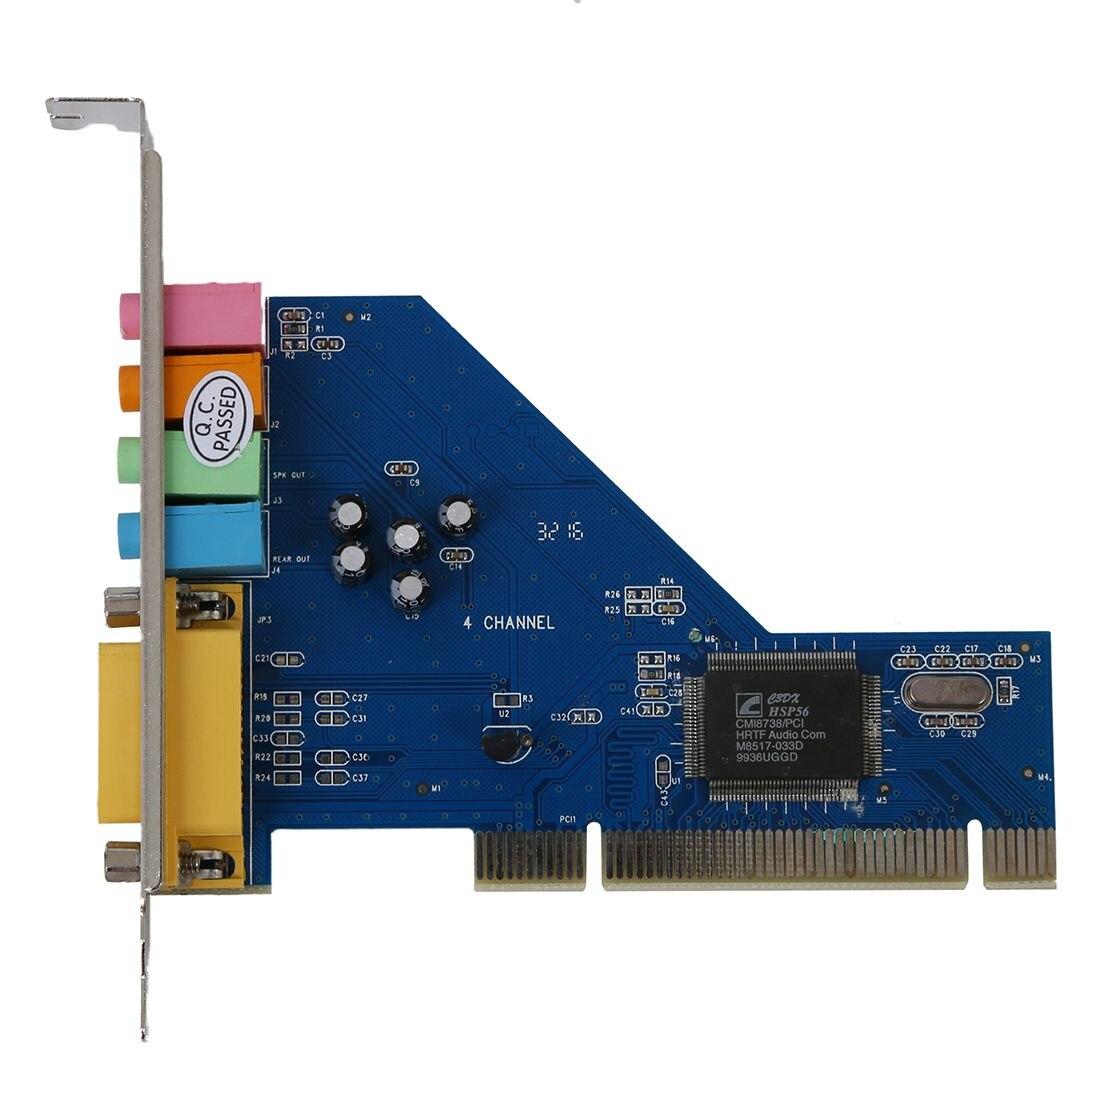 4 Channel C-Media 8738 Chip 3D Audio Stereo Internal PCI Sound Card Win7 64 Bit